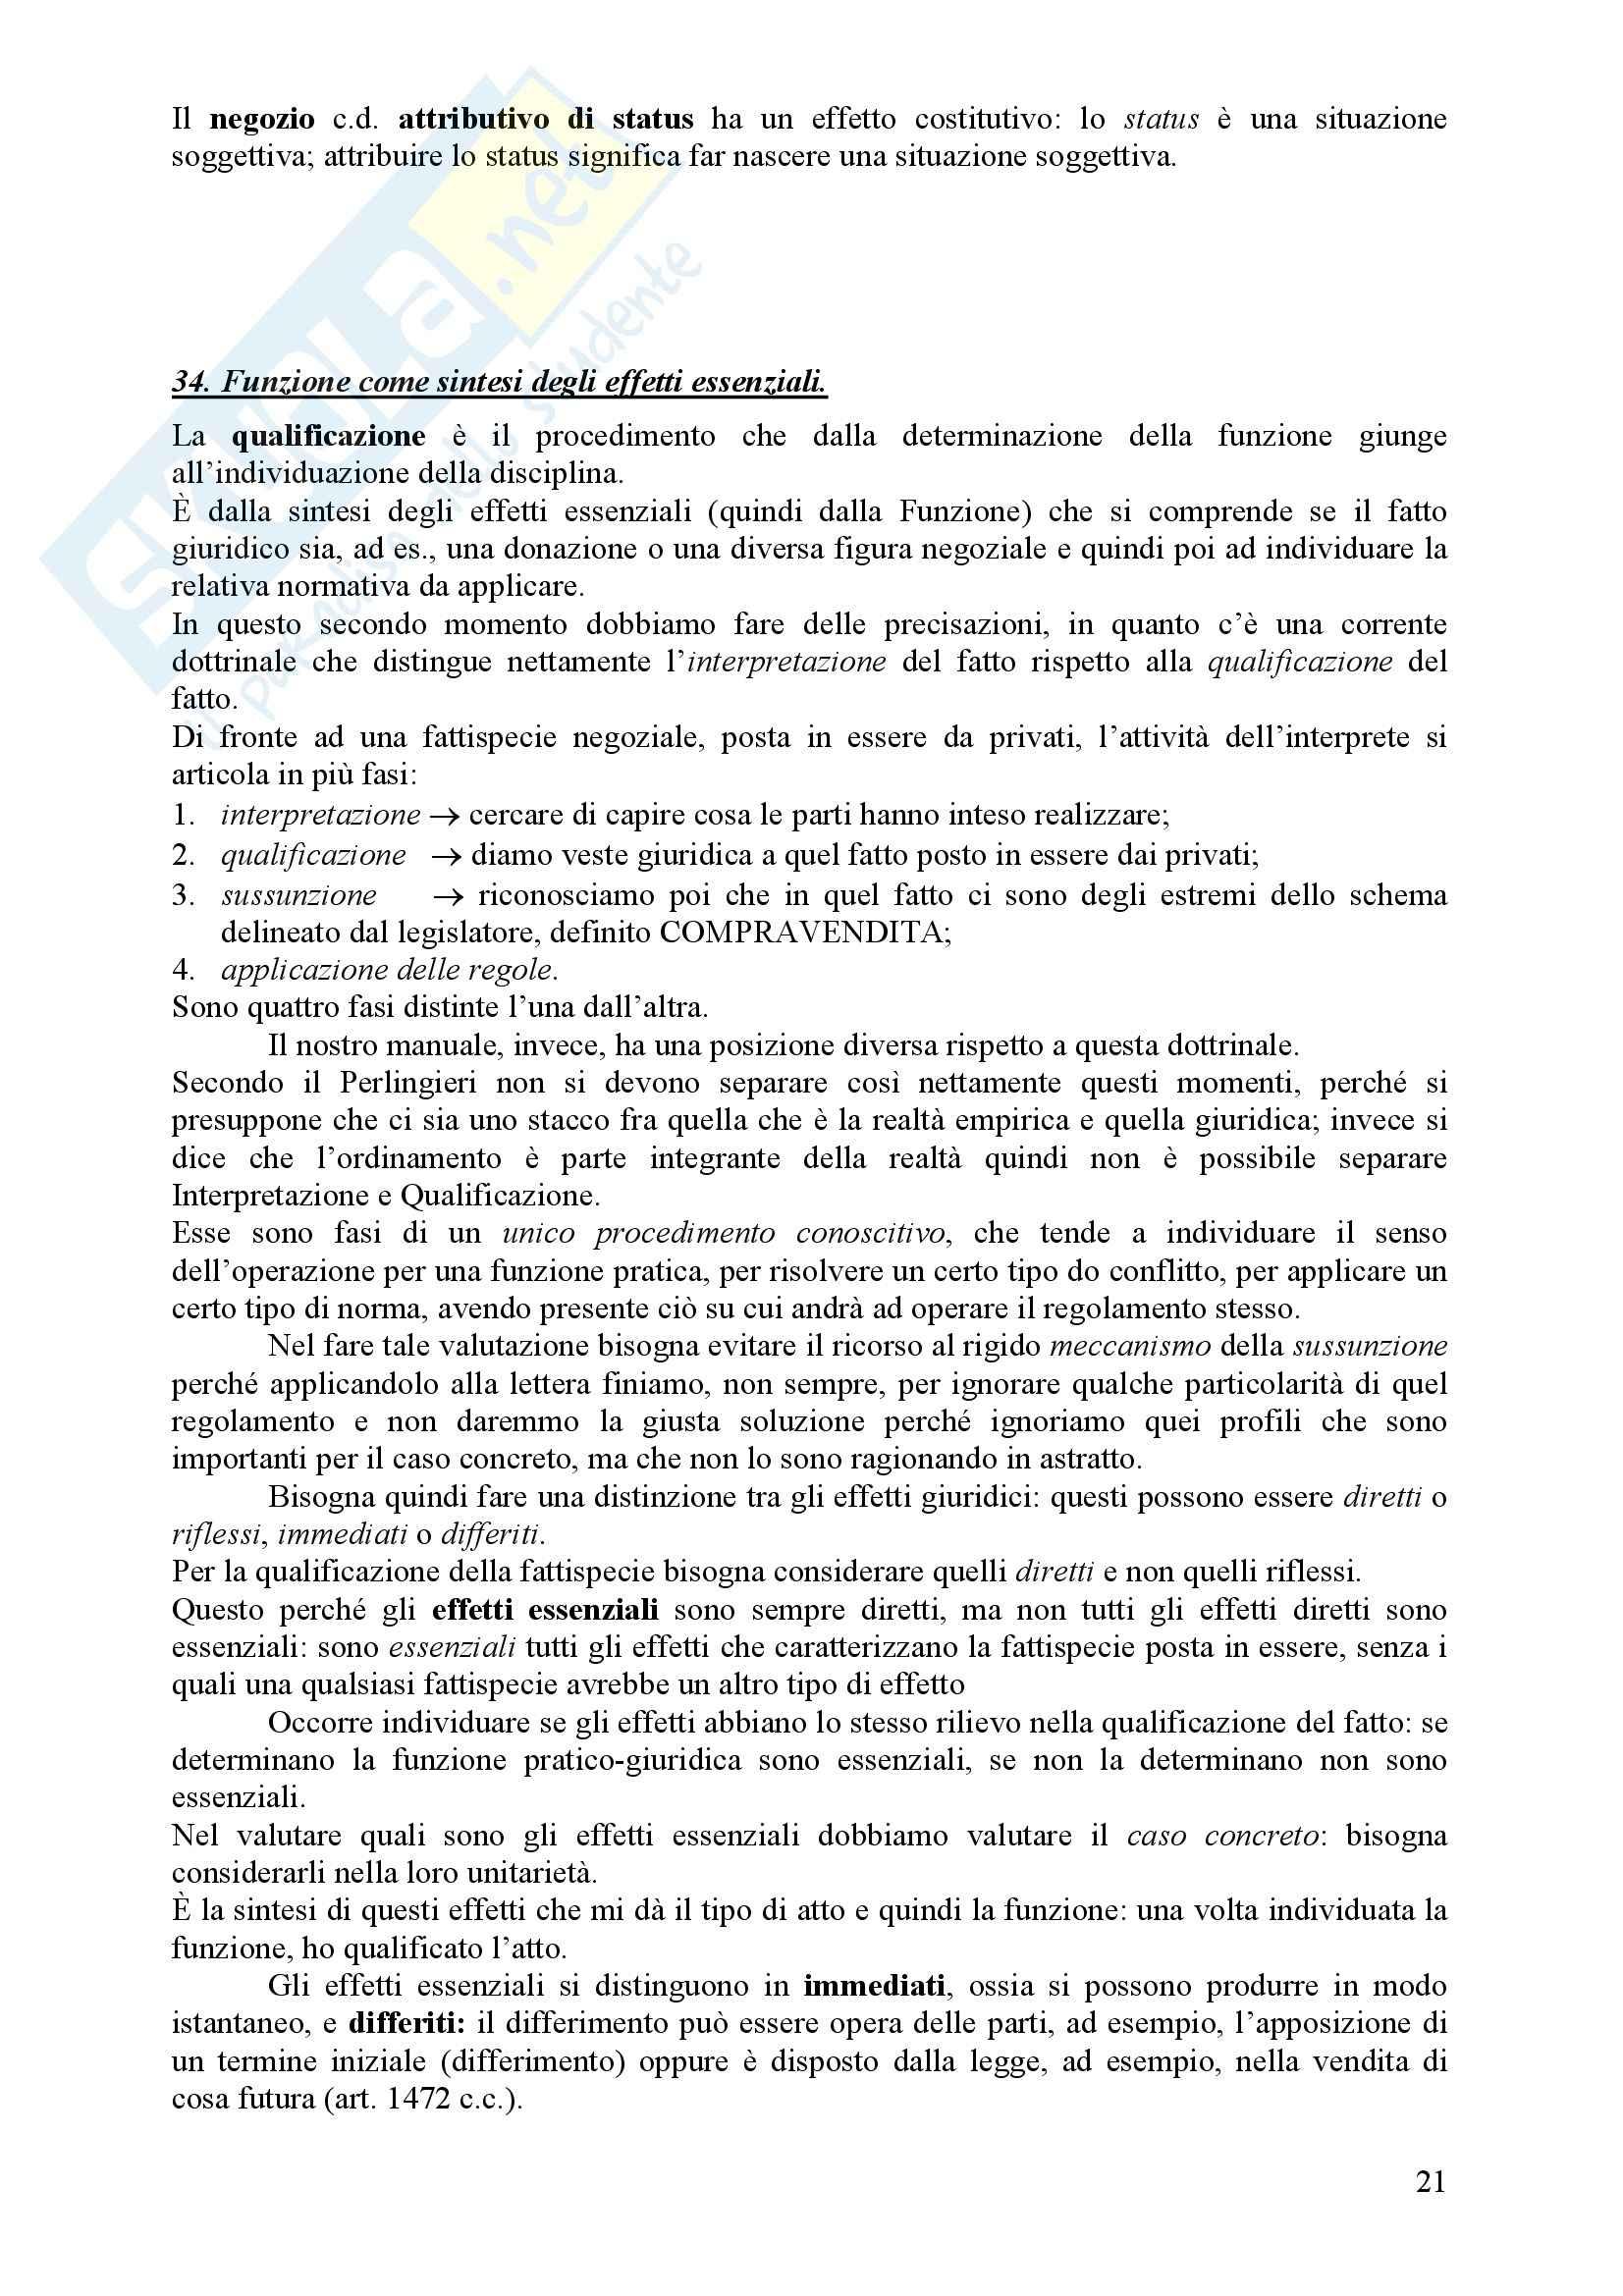 Diritto Civile - Perlingieri – Parte prima – Riassunto esame Pag. 21